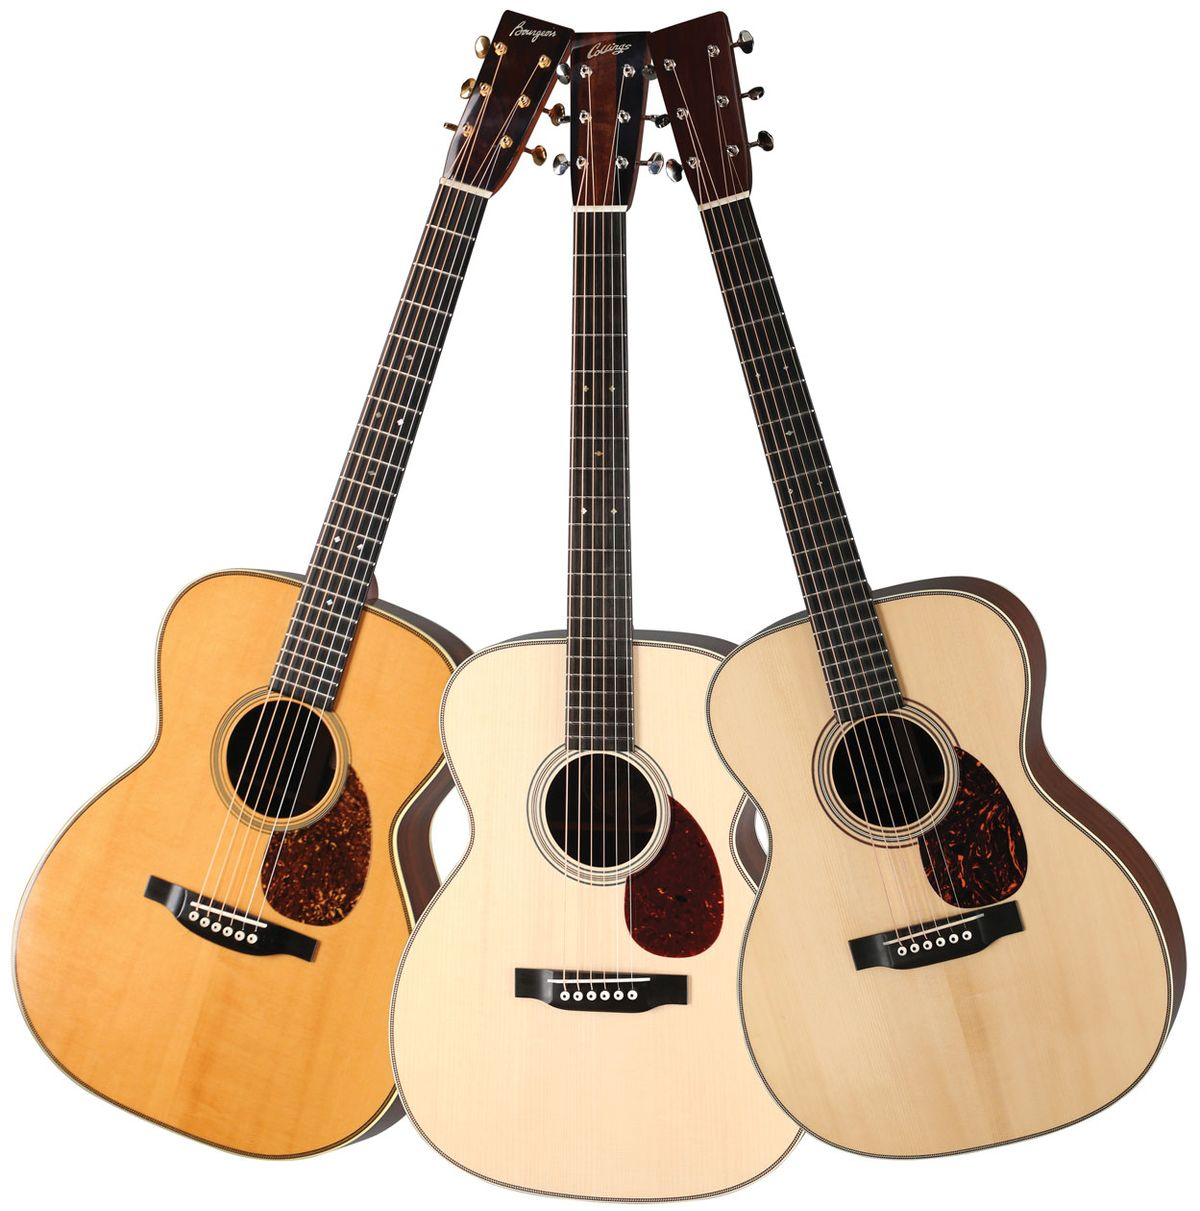 Acoustic Soundboard: Why We Buy Multiple Guitars